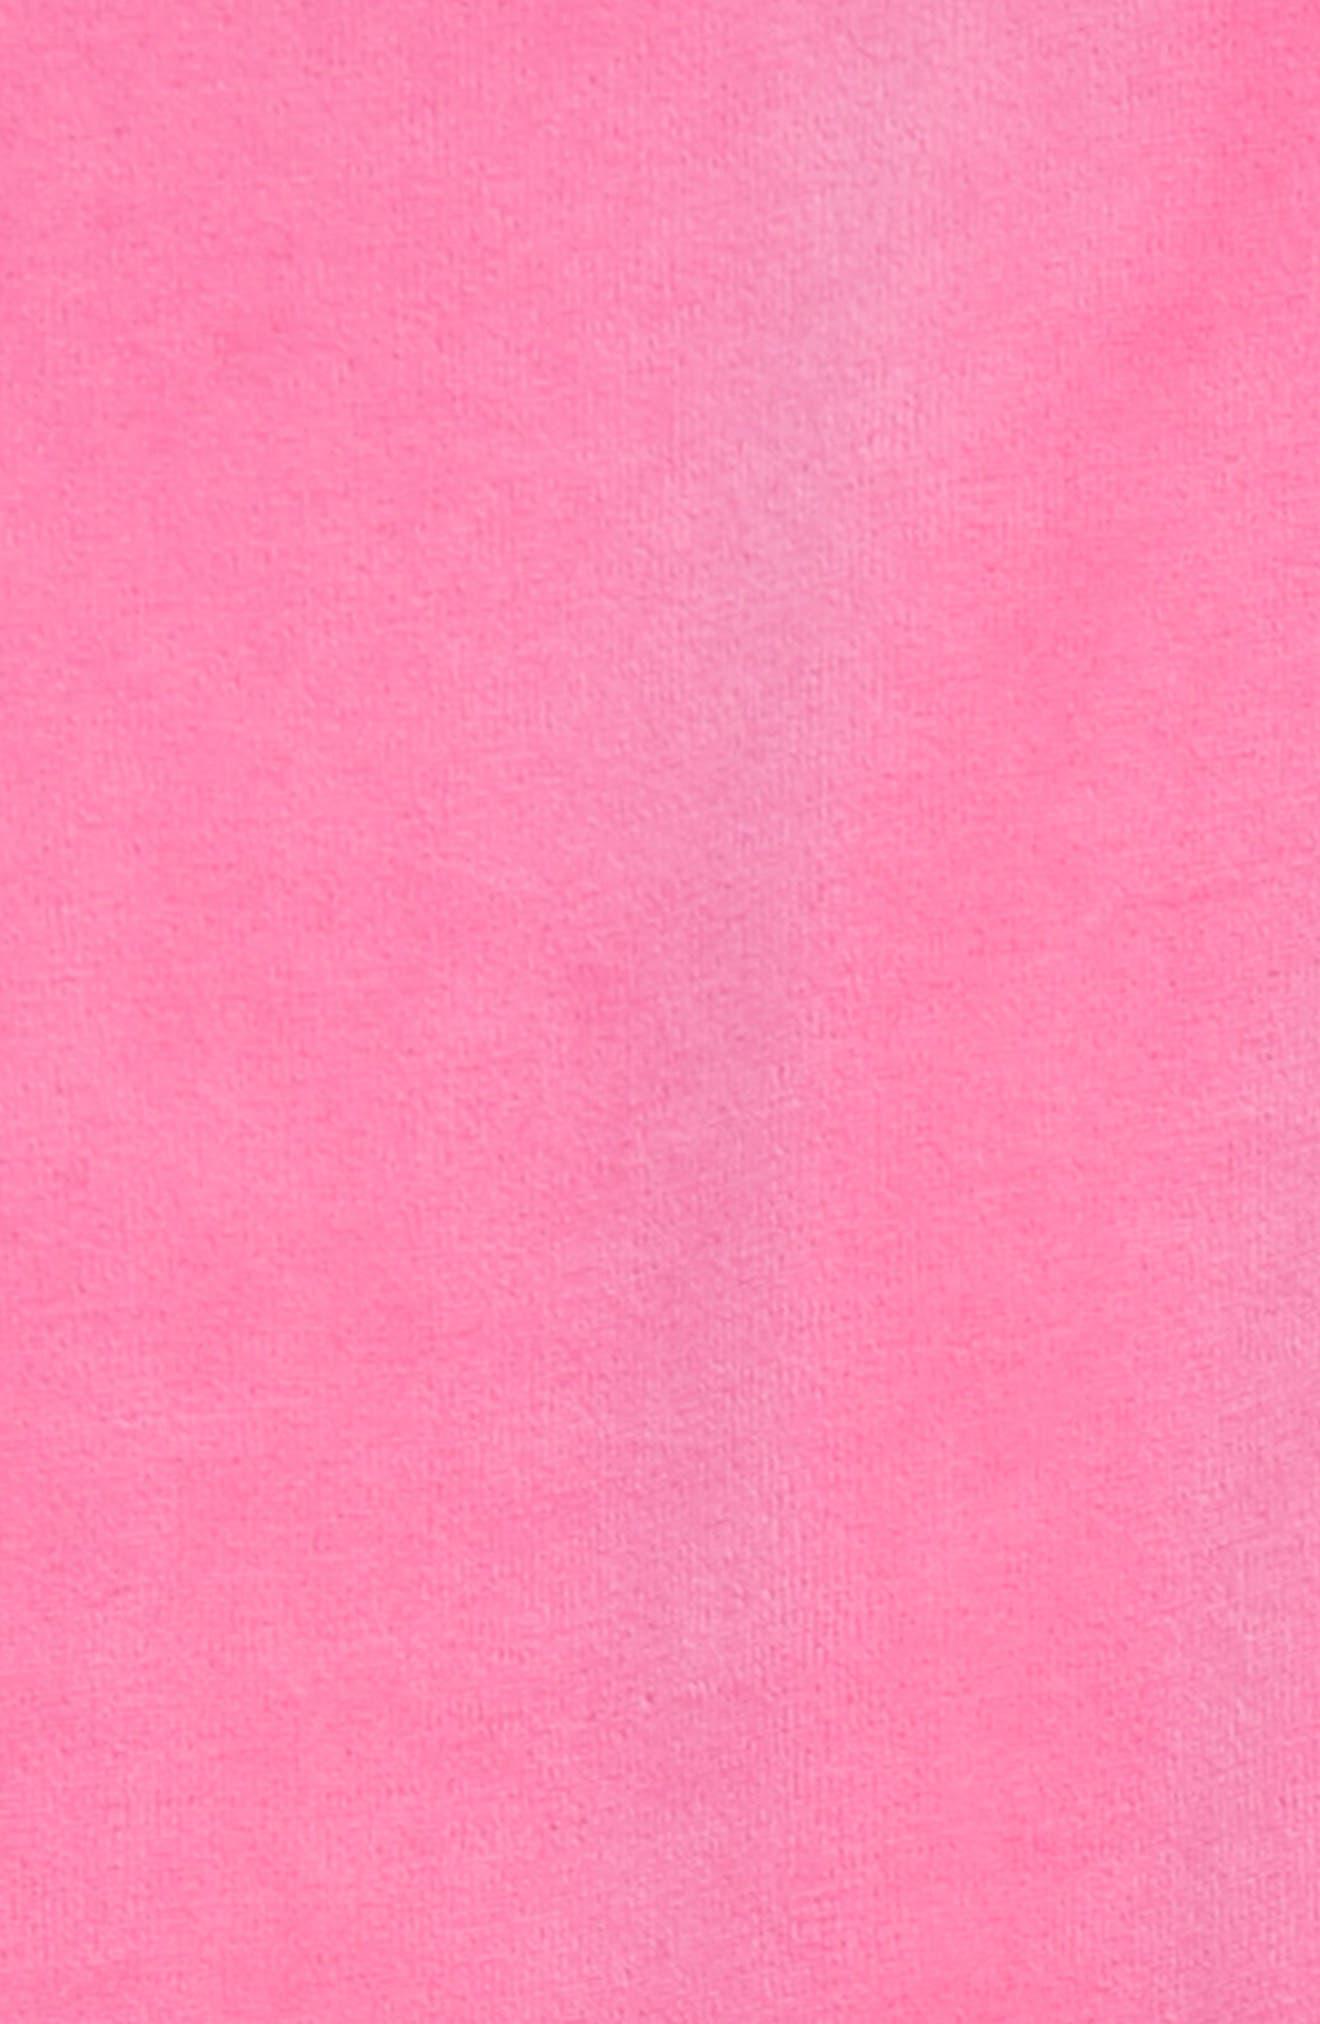 Scotty Crest Zuma Velour Pants,                             Alternate thumbnail 2, color,                             660